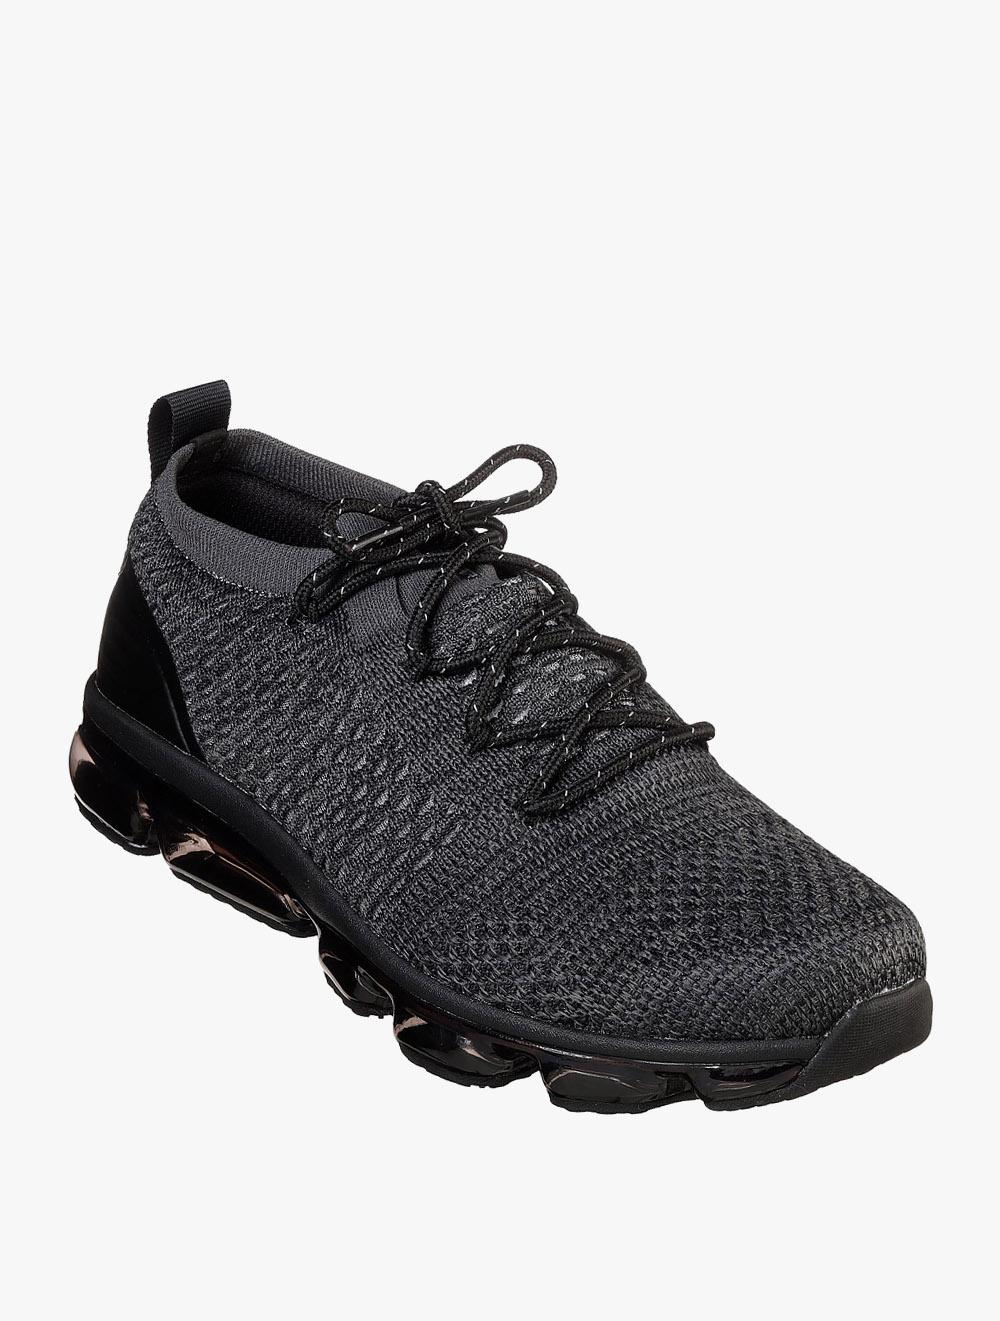 Skech Air Atlas Men's Sneakers Shoes